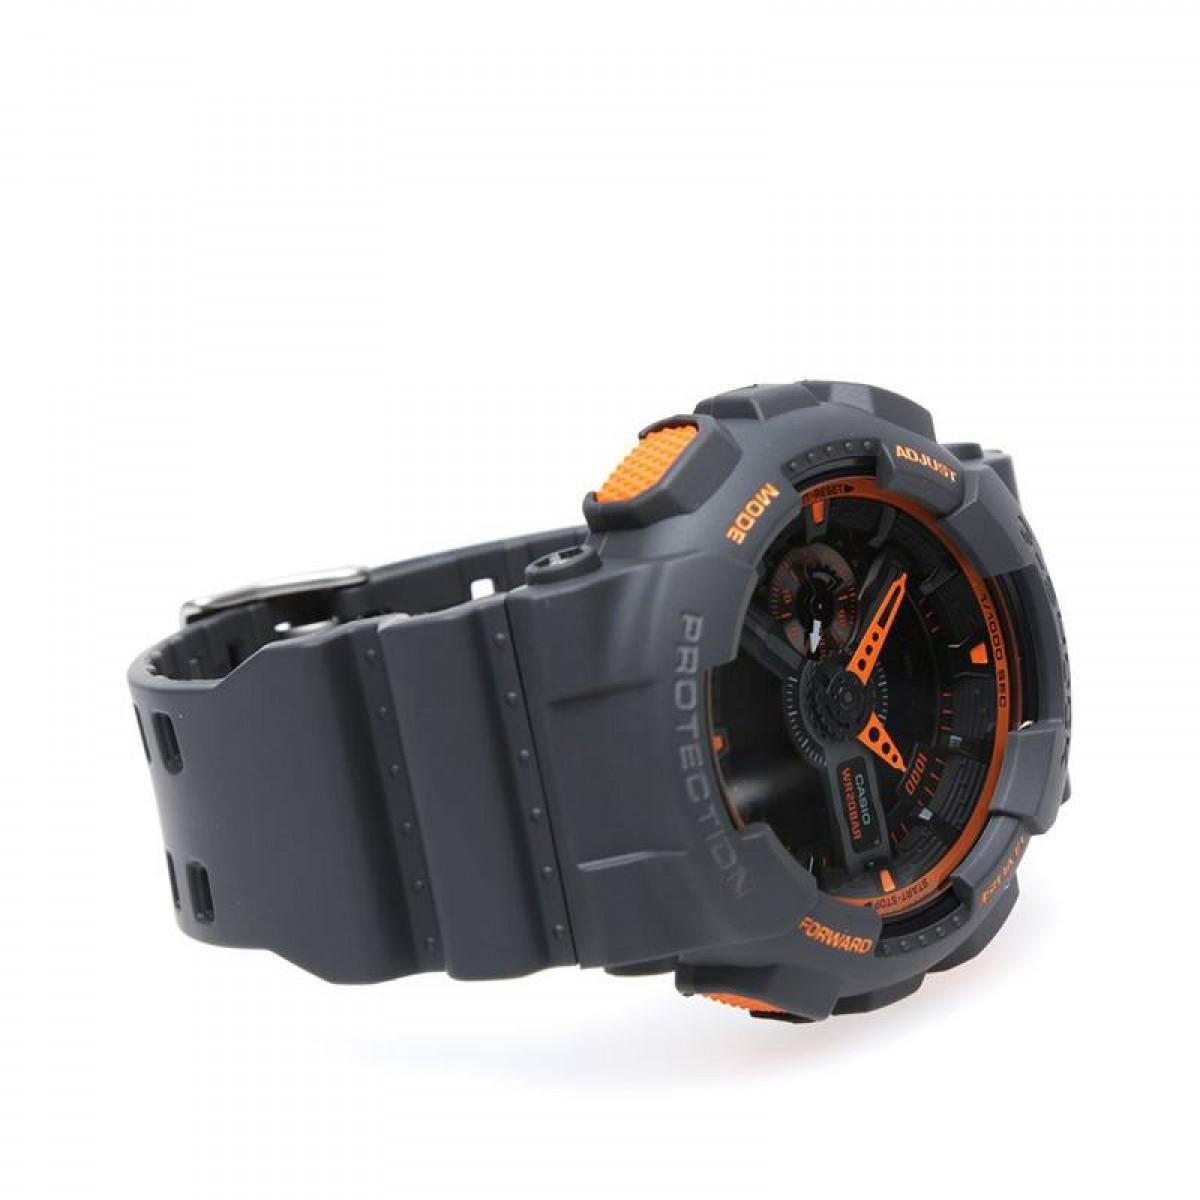 Часовник Casio G-Shock GA-110TS-1A4ER